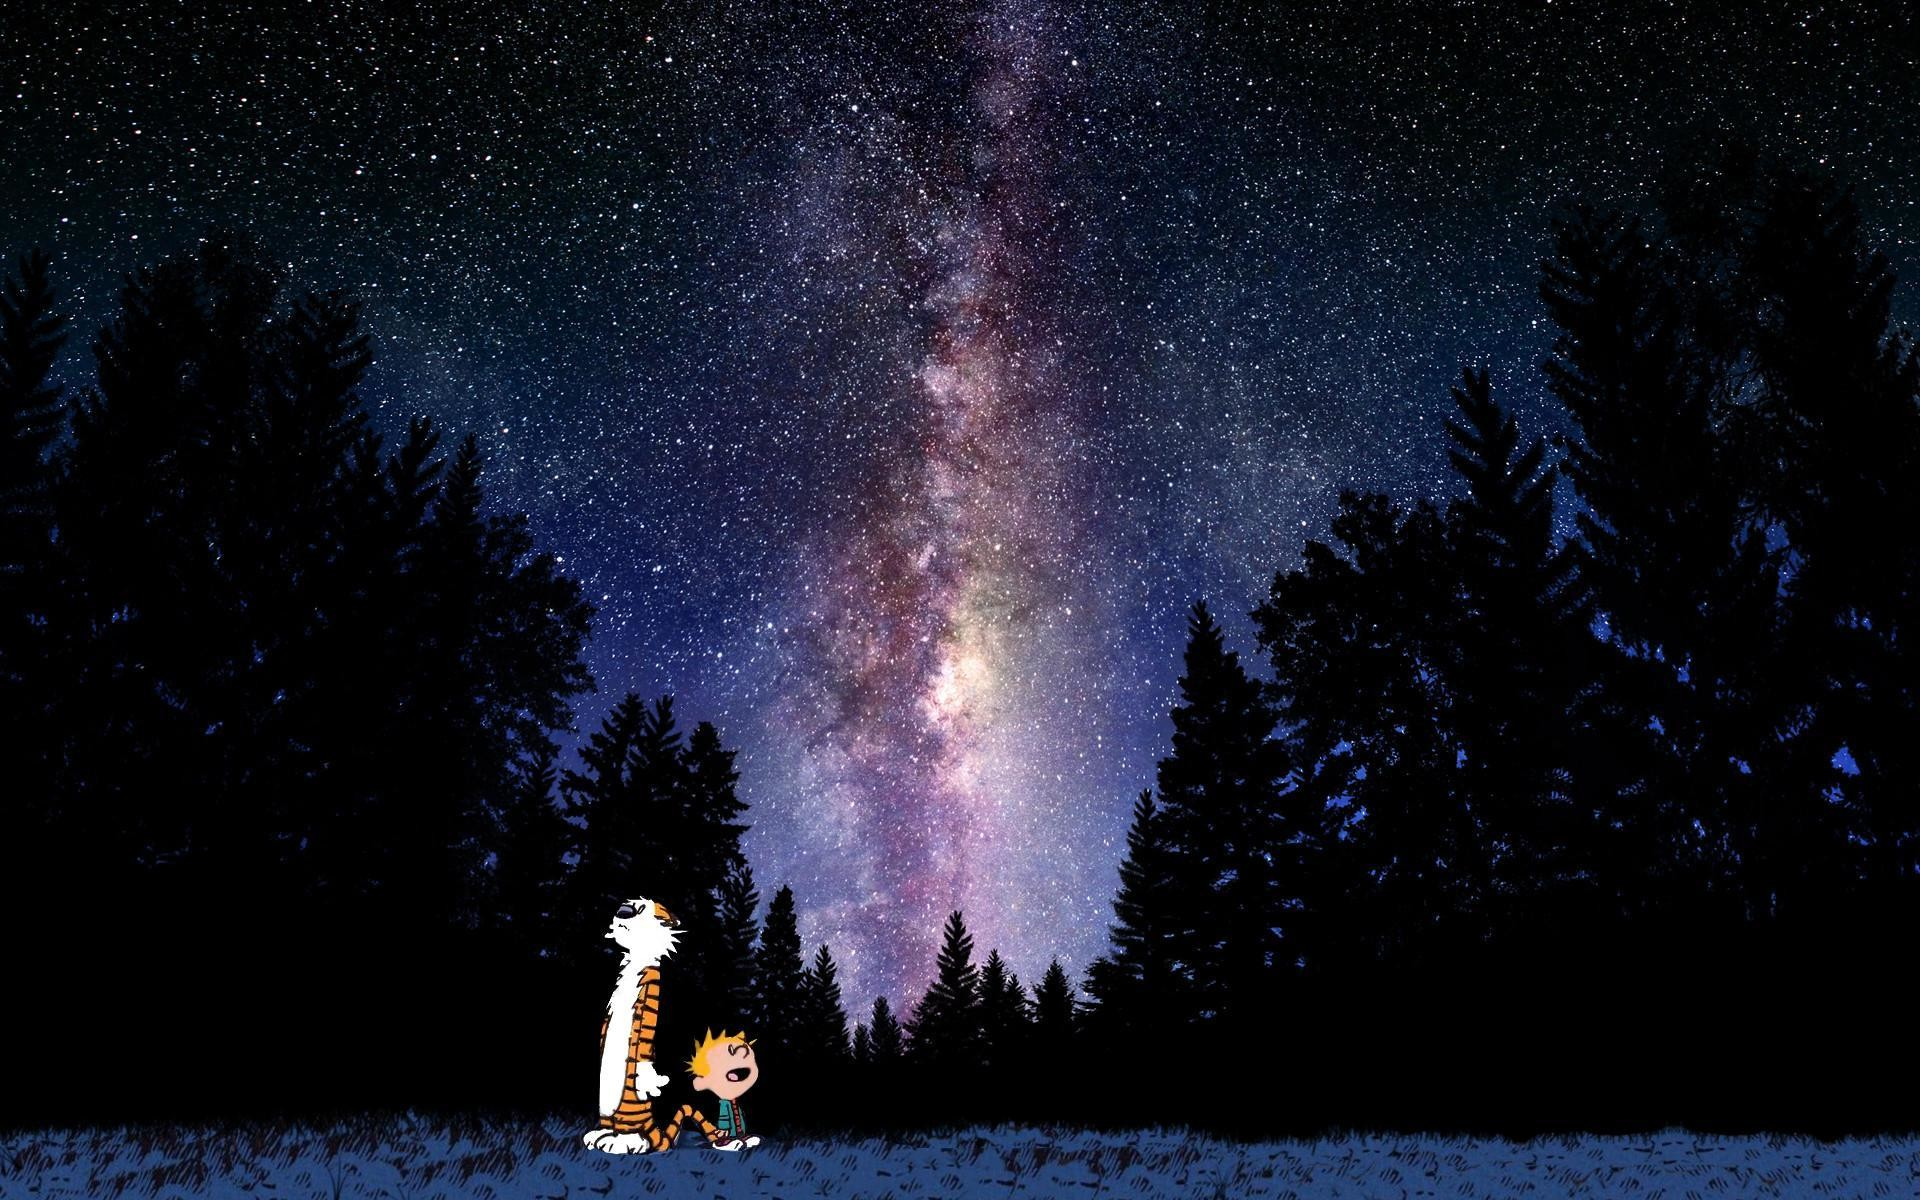 Calvin And Hobbes Looking At Stars Wallpaper | | ID:35253